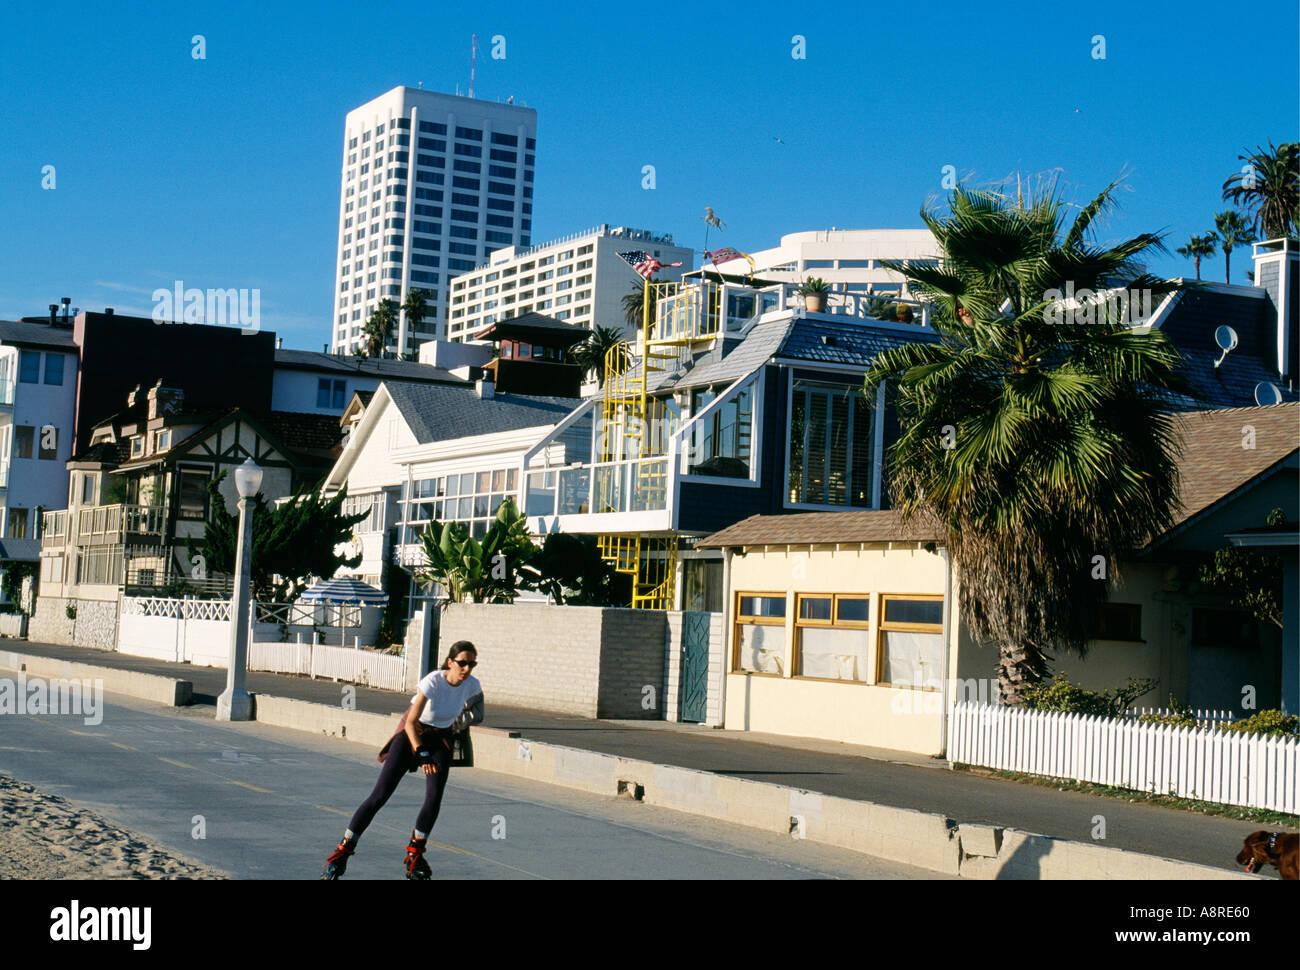 Roller skating los angeles - A Woman Roller Skating In Santa Monica Los Angeles California Usa